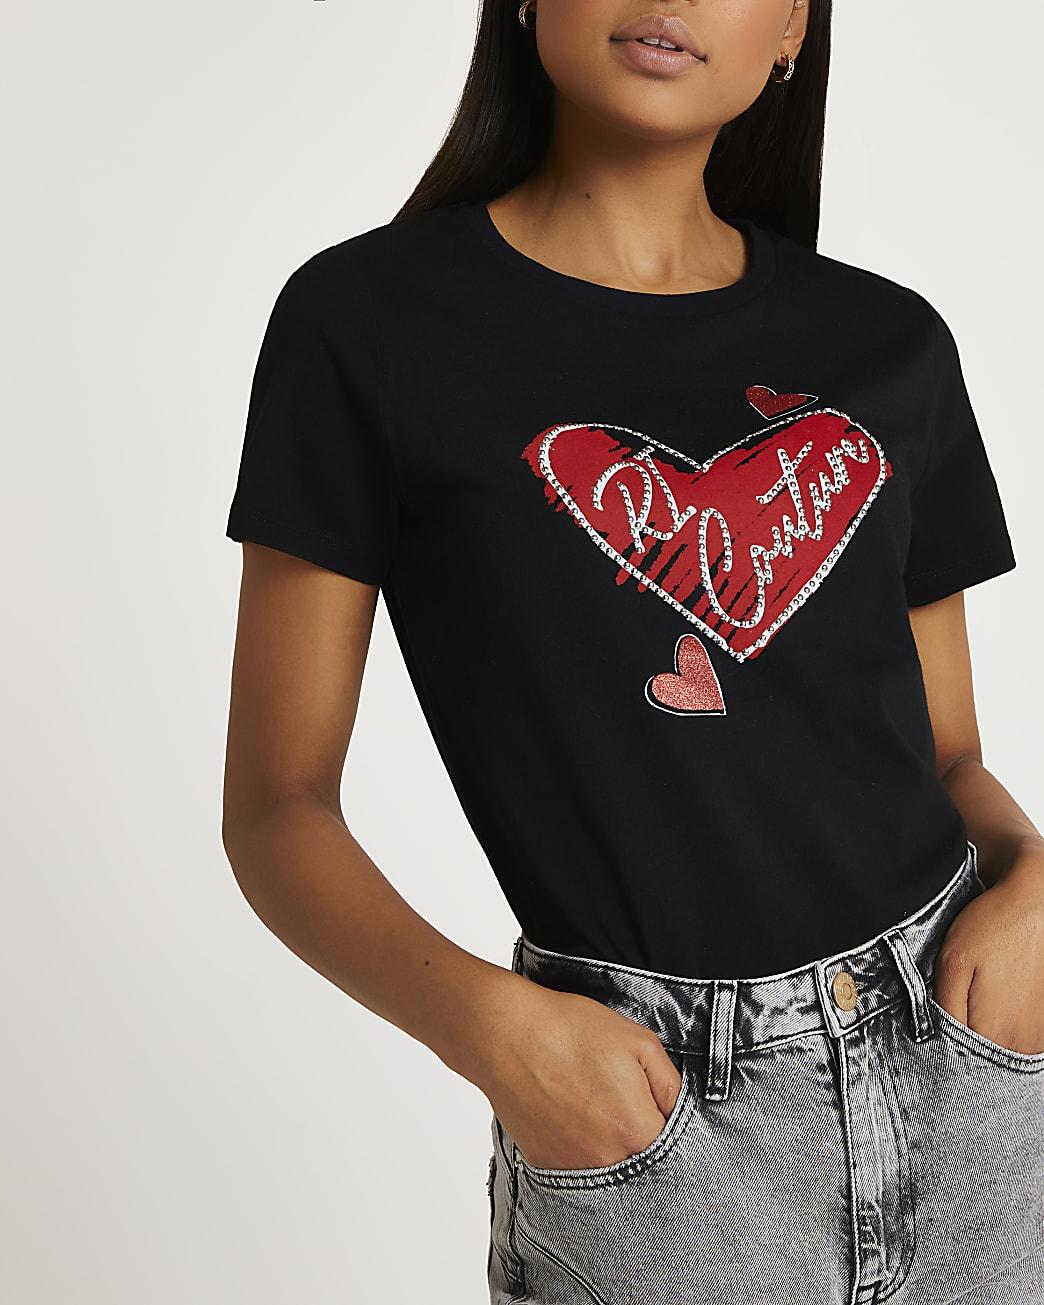 Black 'RI Couture' graphic t-shirt